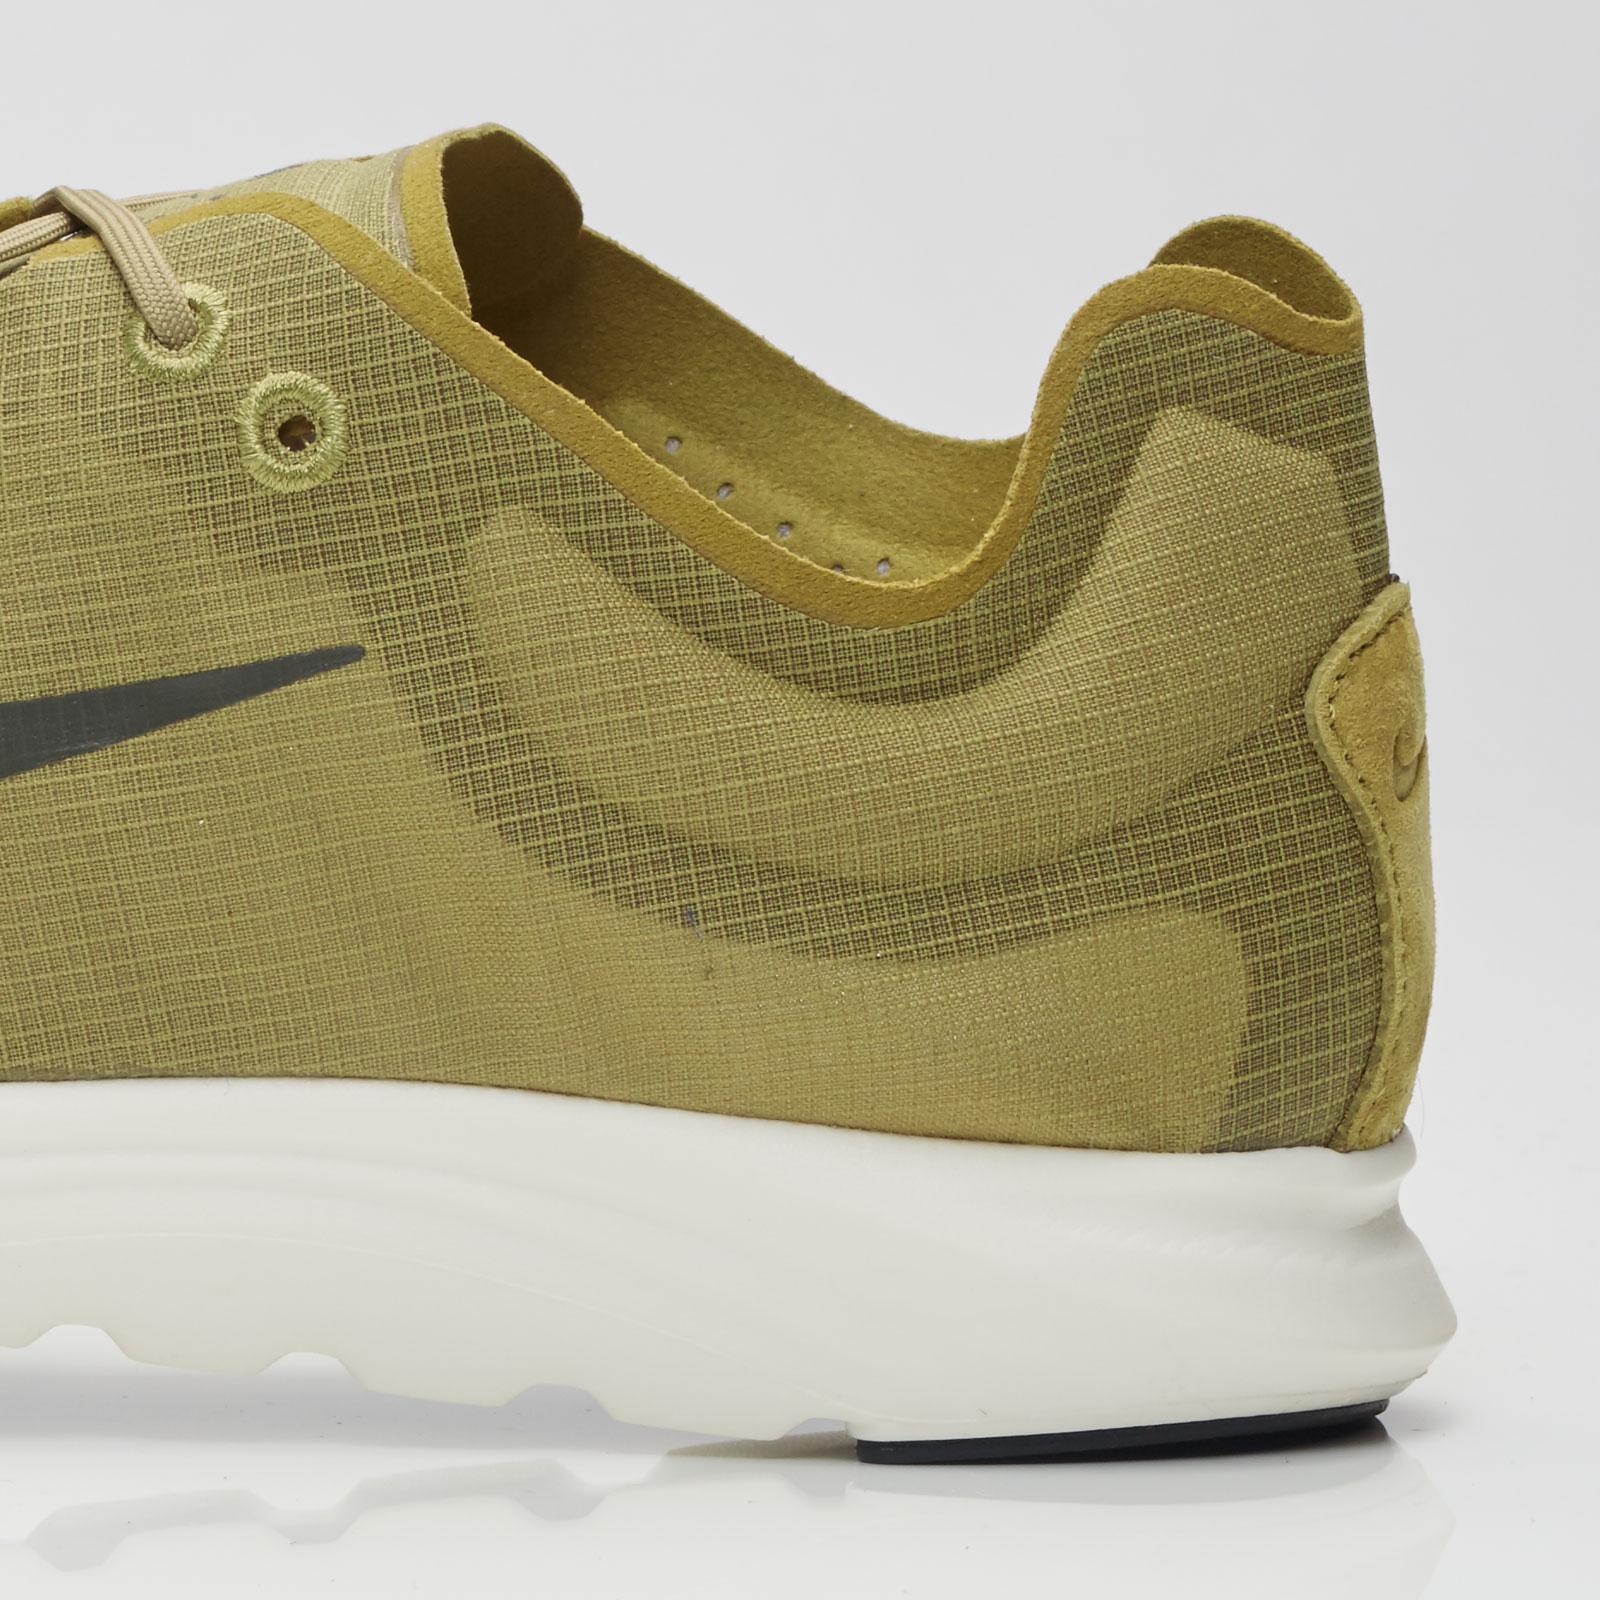 2822c411f04 Nike Mayfly Lite - 909555-301 - Sneakersnstuff